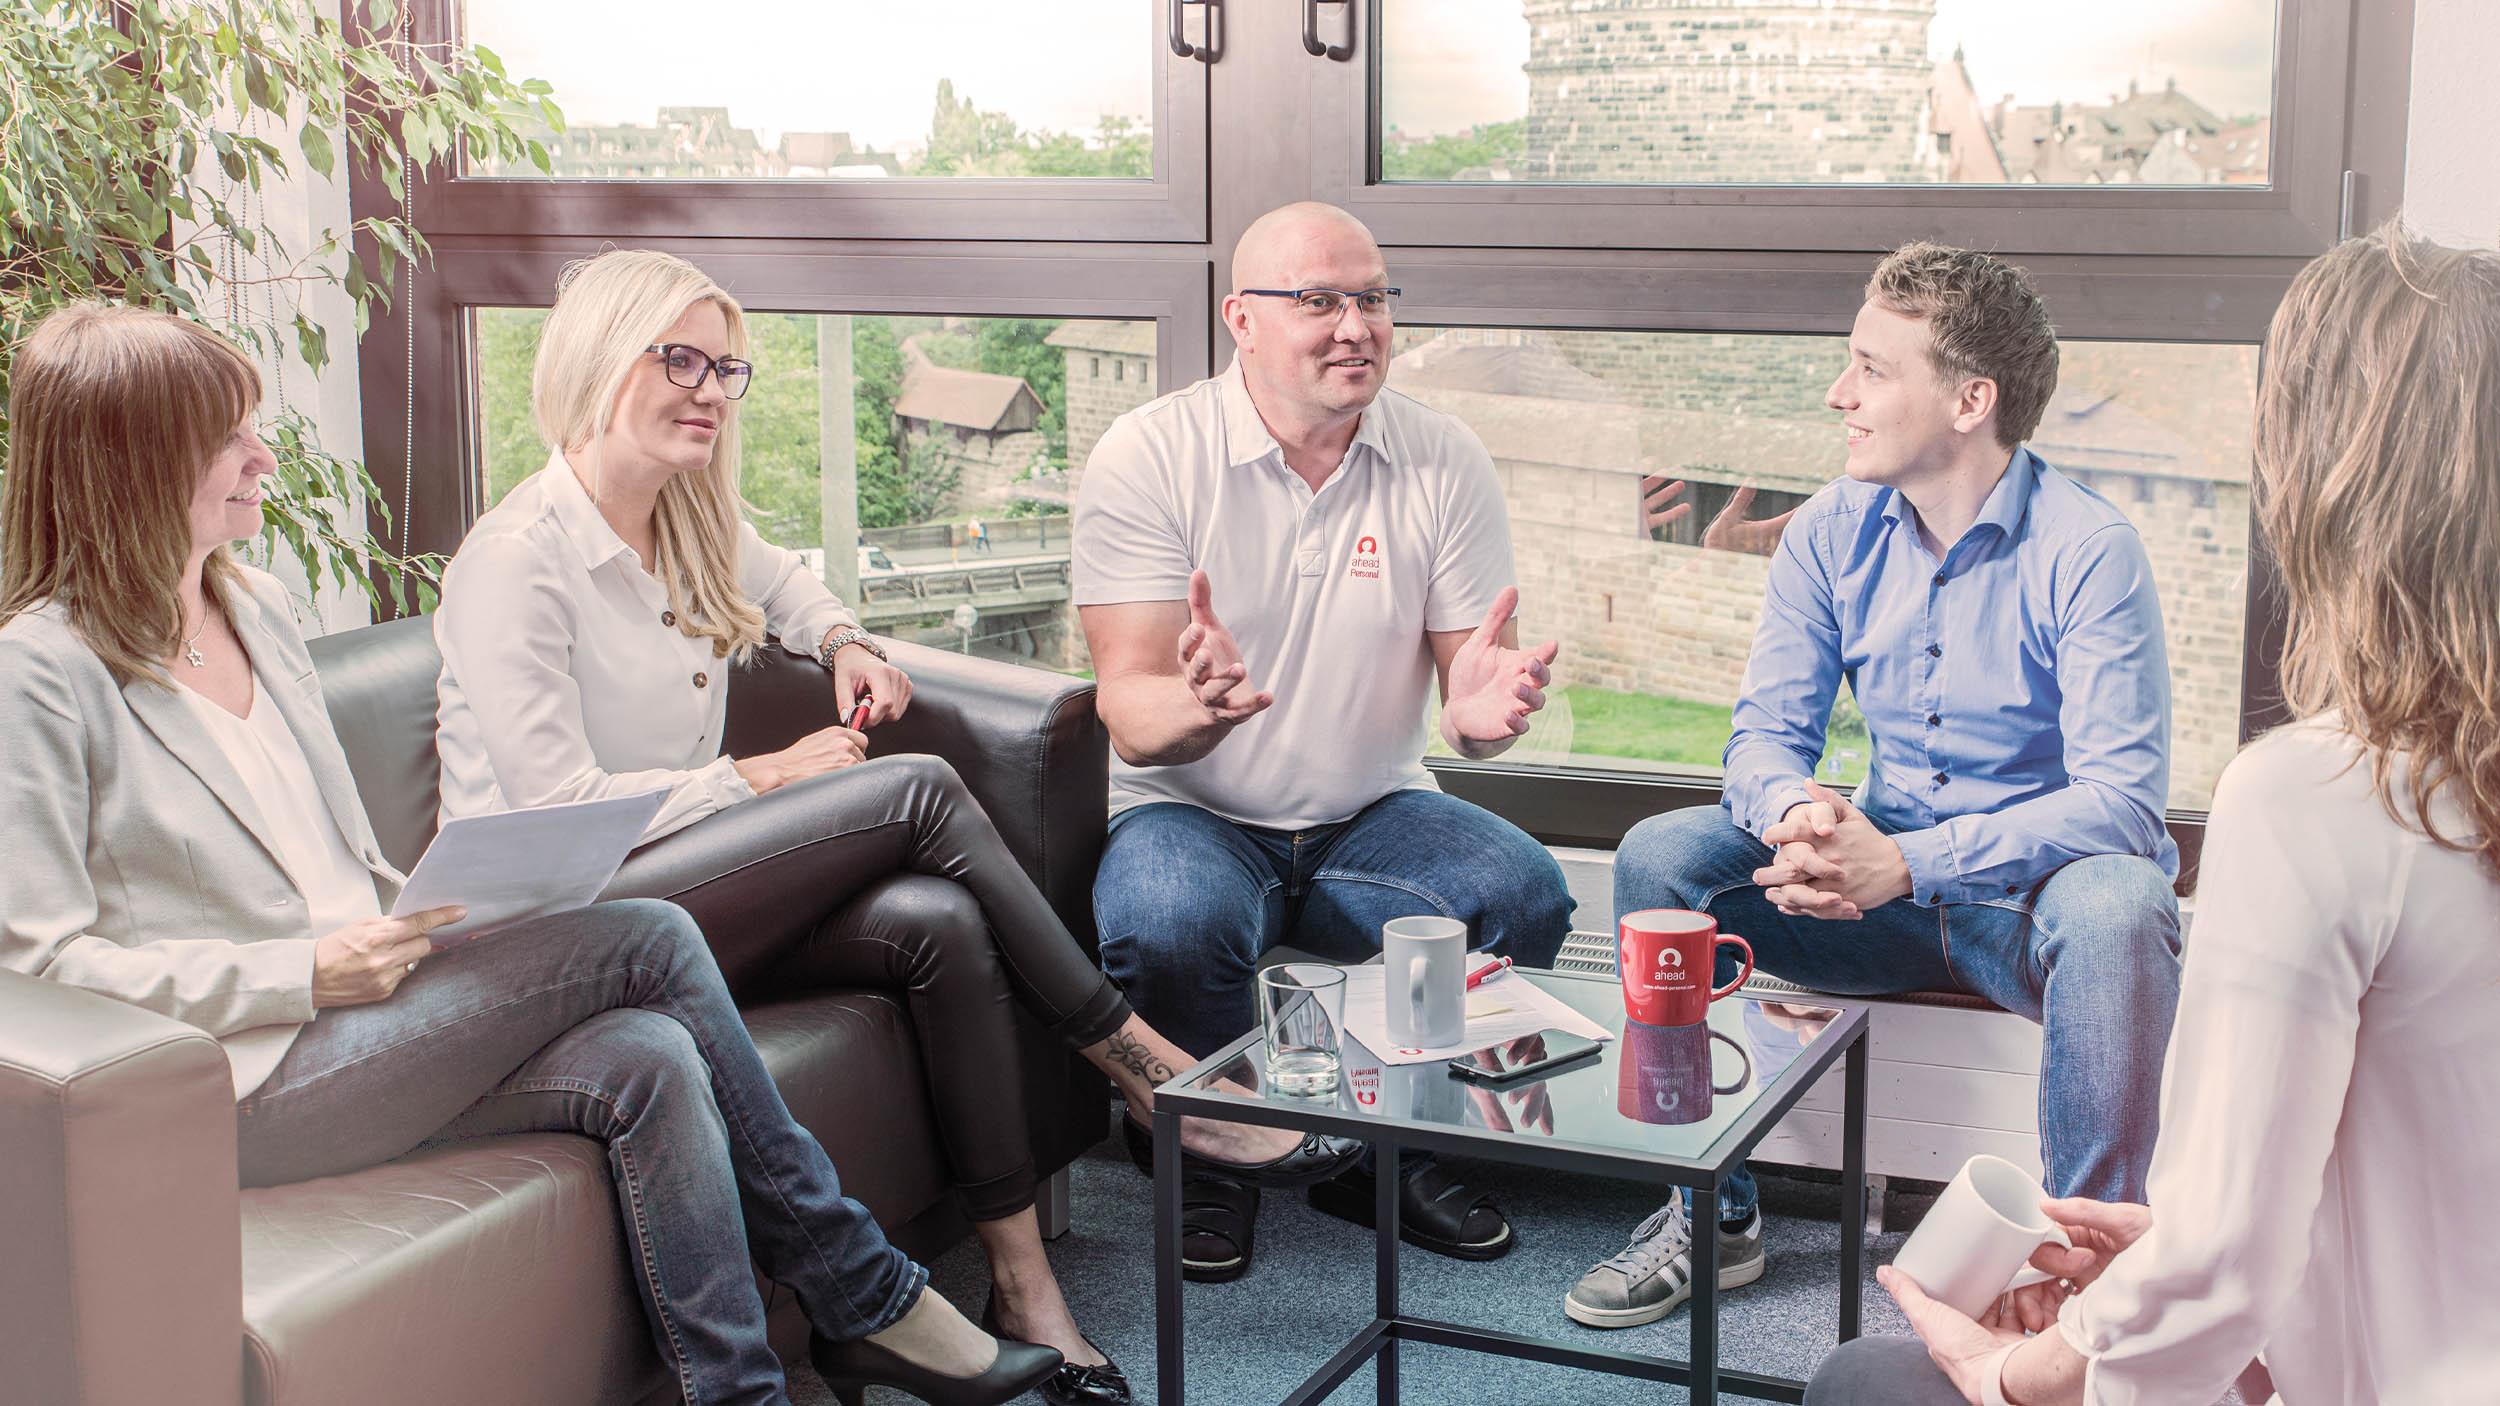 Team diskutiert über Jobsuche Bewerber